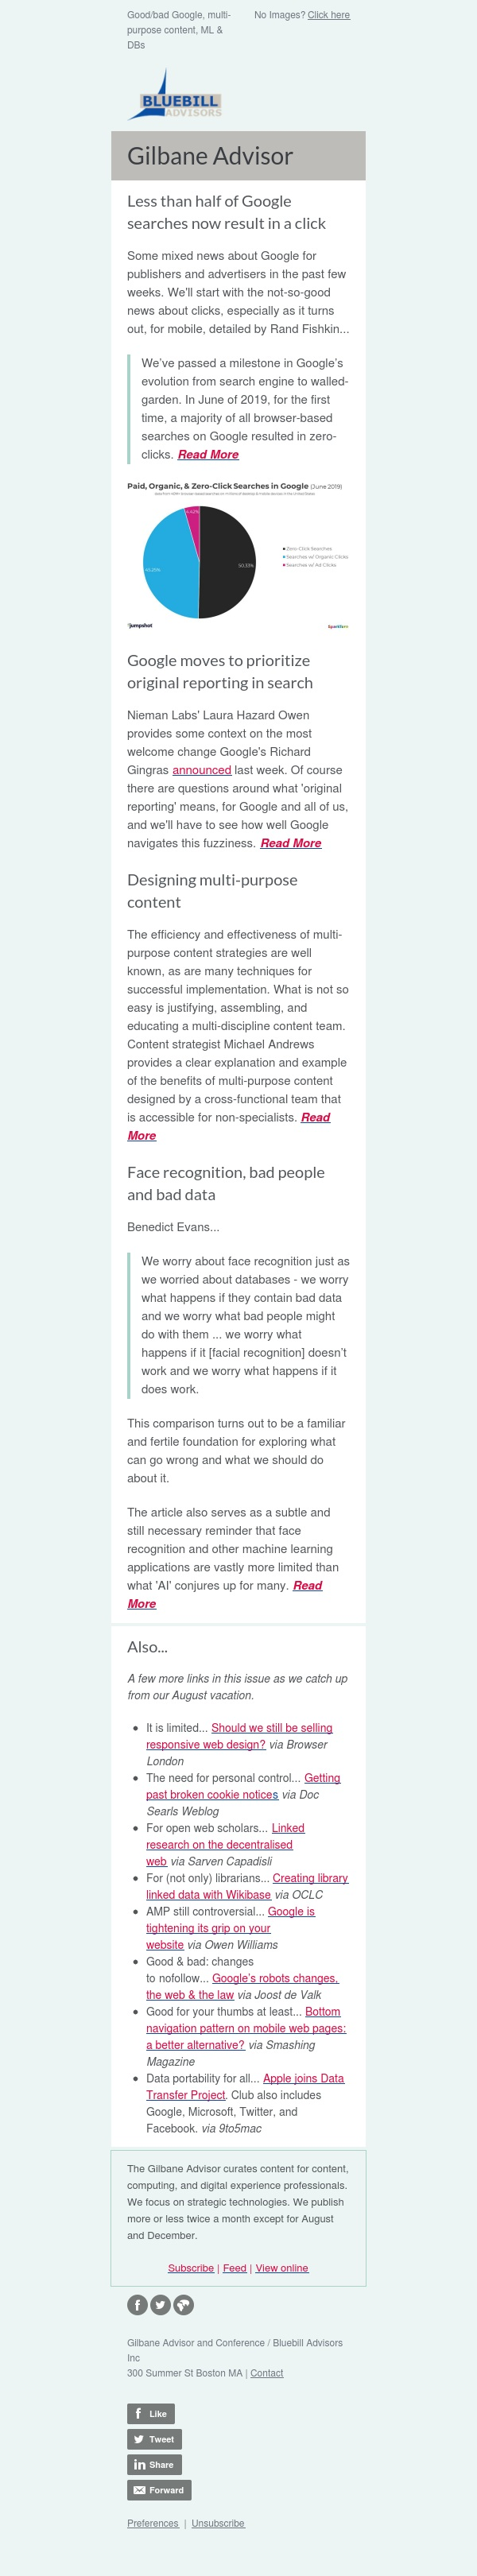 Gilbane Advisor 9-18-19 — Good/bad Google, multi-purpose content, face recognition & DBs